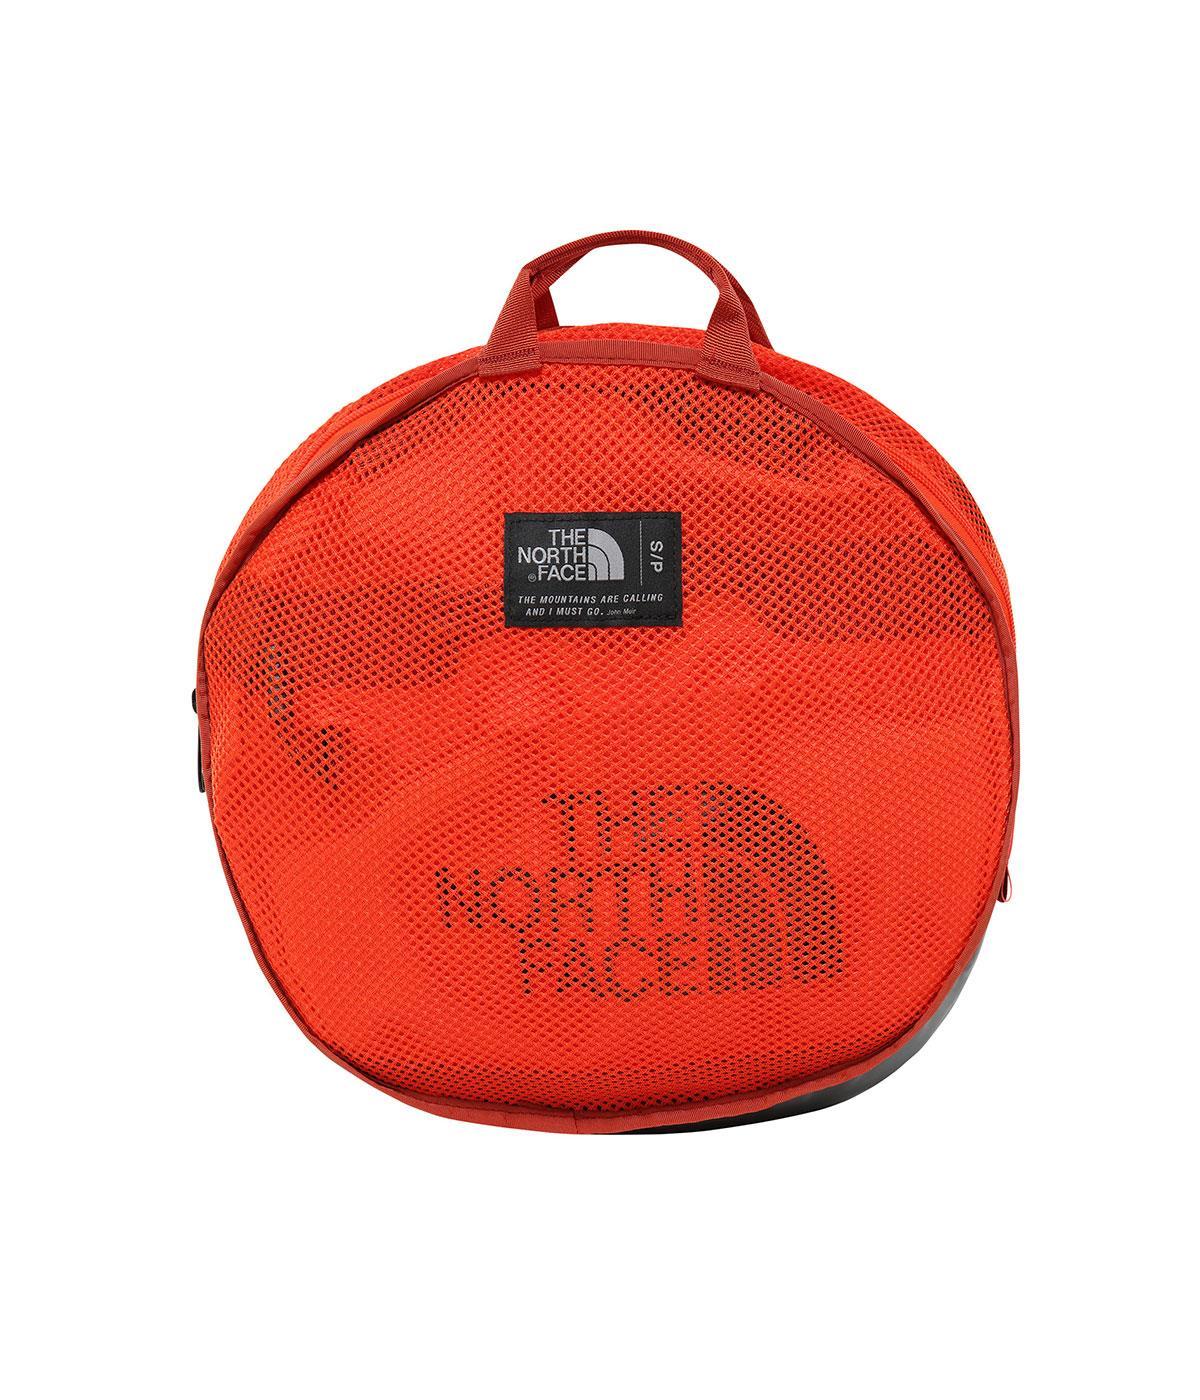 The North Face Base Camp Duffel - S Nf0A3Etofj51